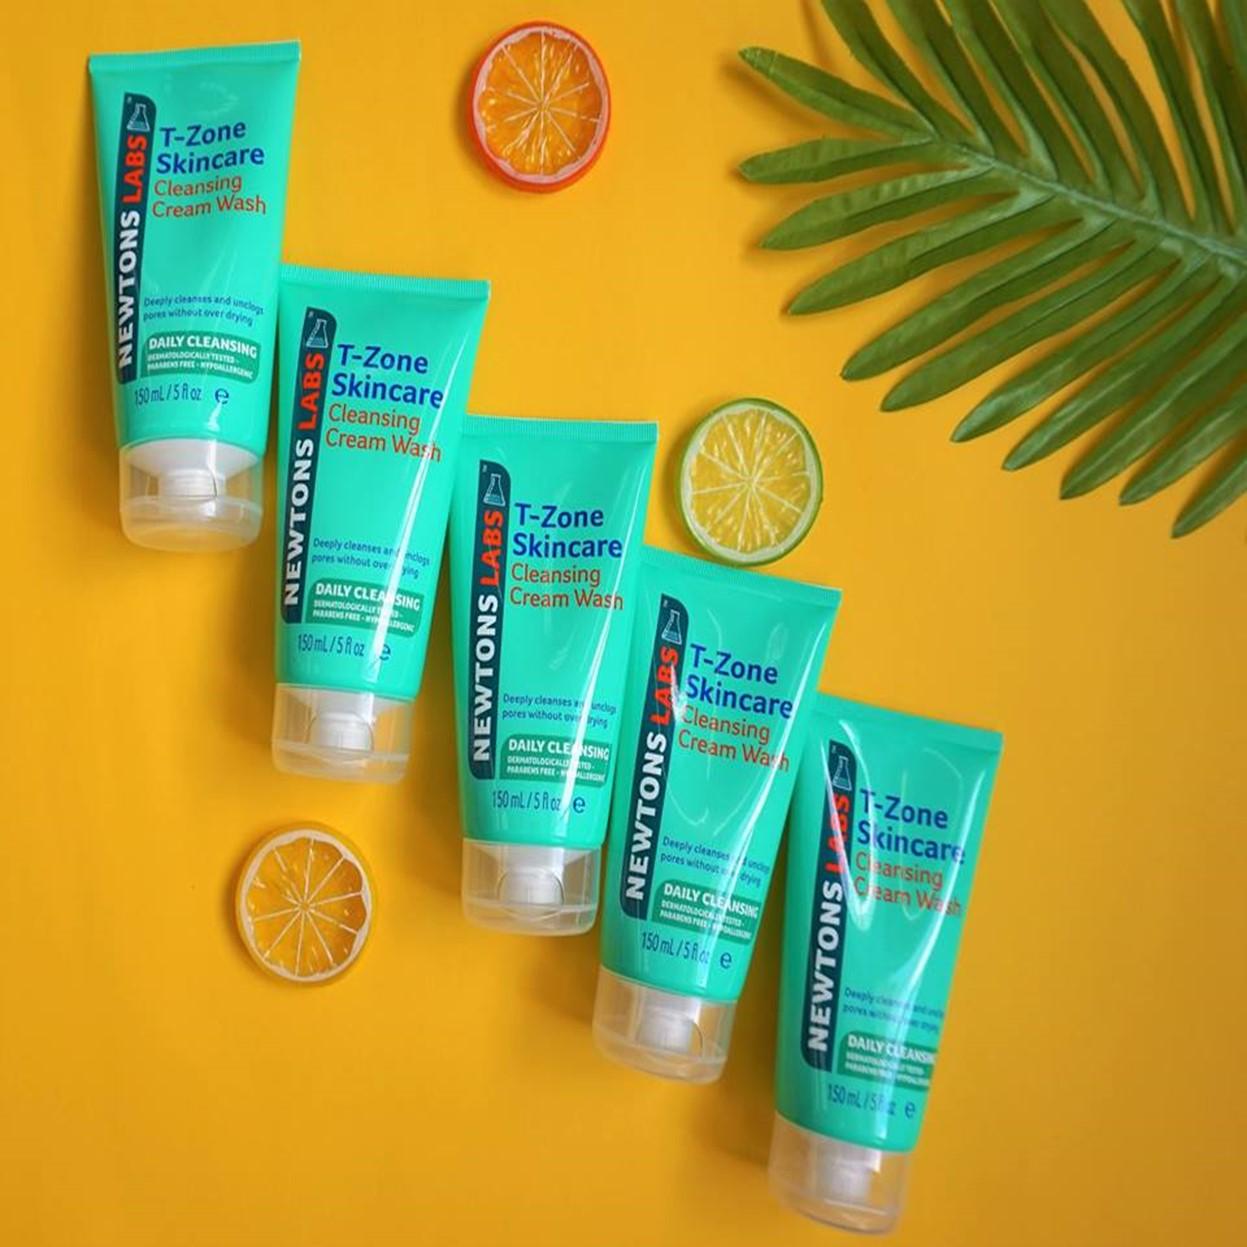 Kem Rửa Mặt Làm Sạch Sâu T-Zone Cleansing Cream Wash 150ml | Tiki.vn